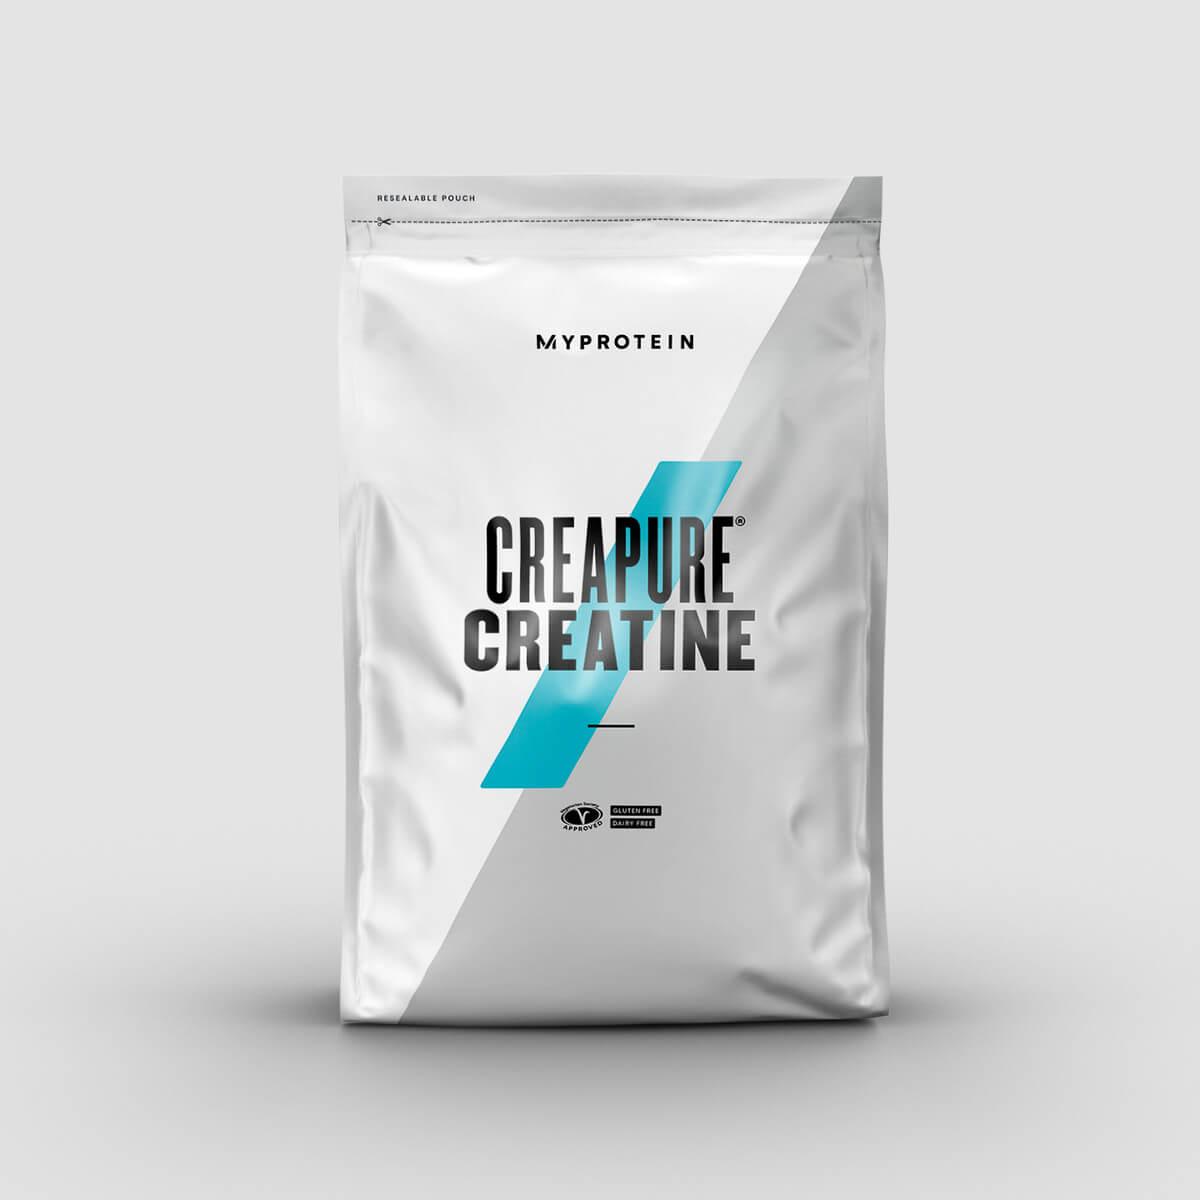 Myprotein Creatine Monohydrate Creapure Příchuť: Neochucený, Hmotnost: 500g